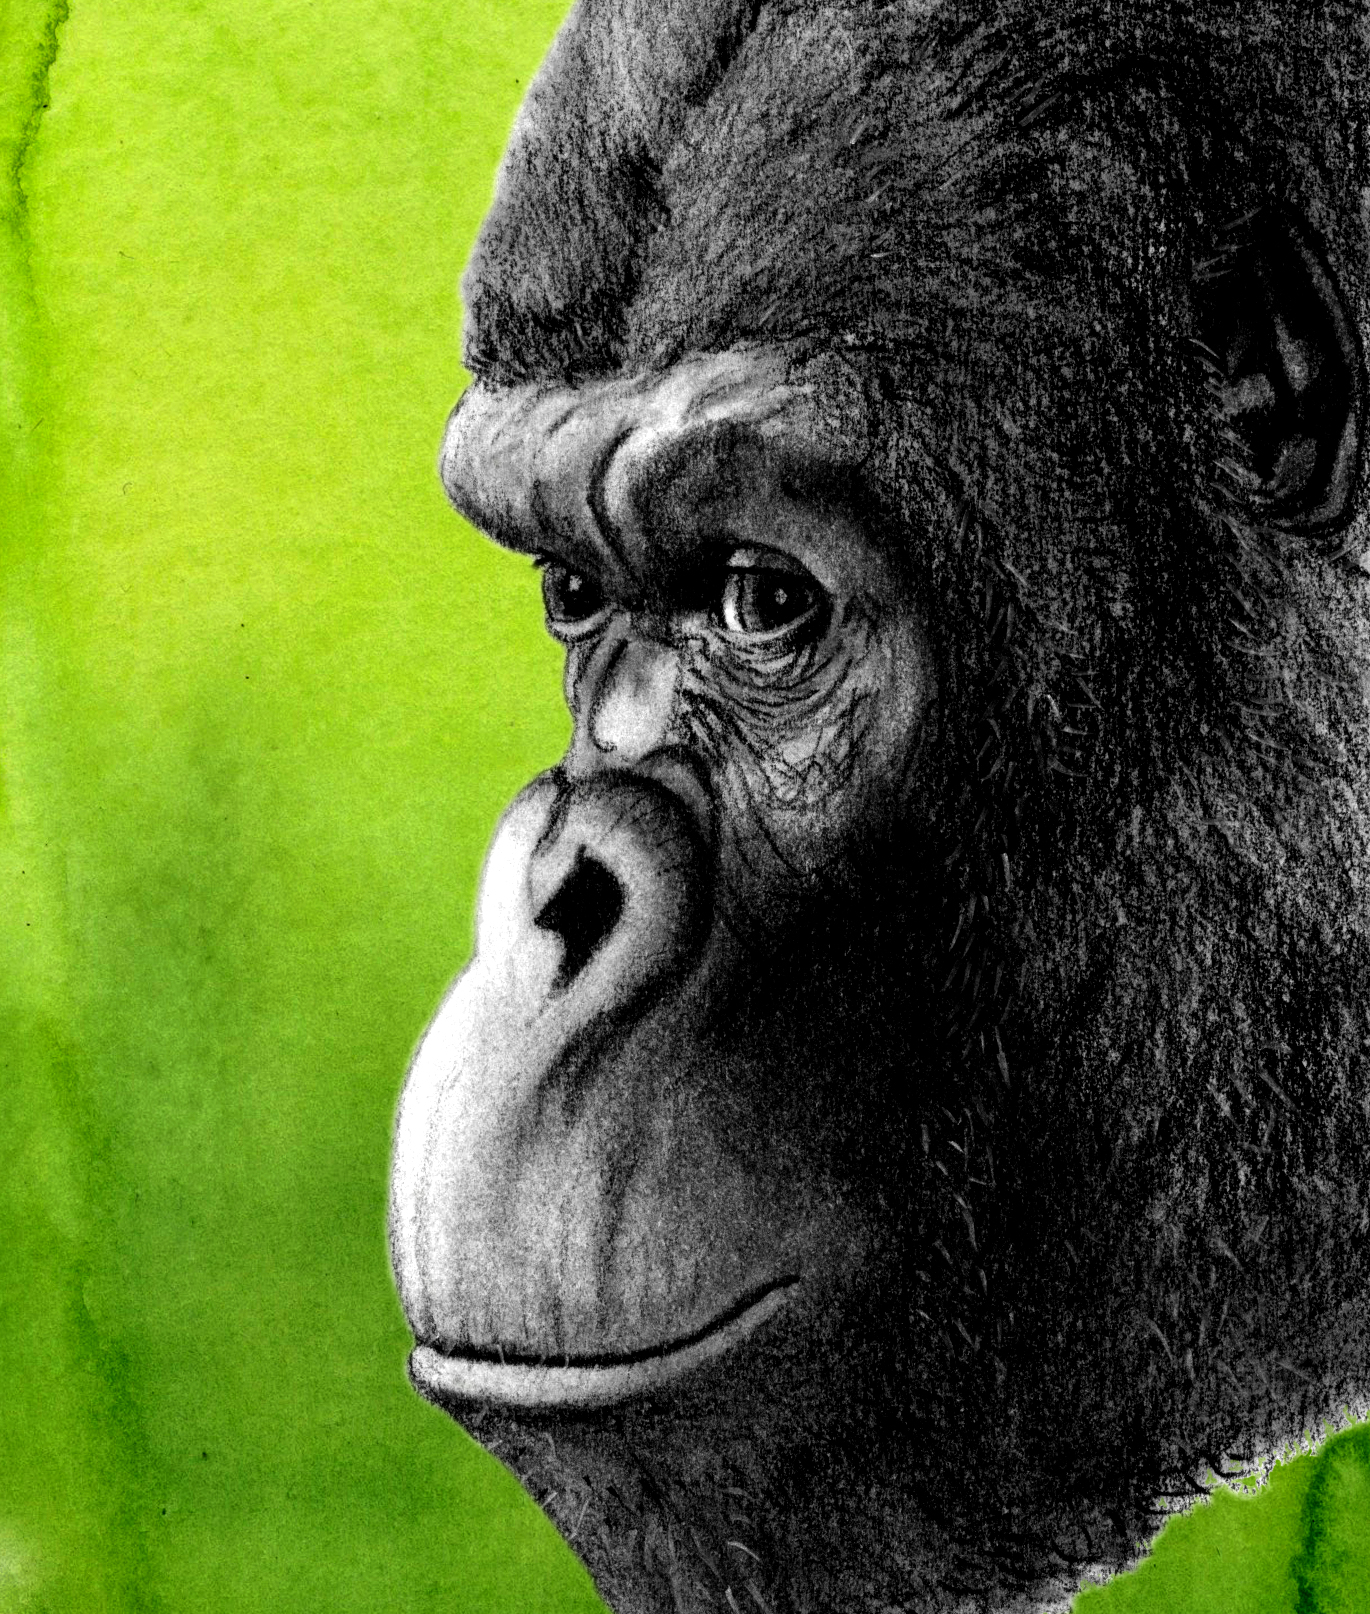 gorilla_profile.jpeg